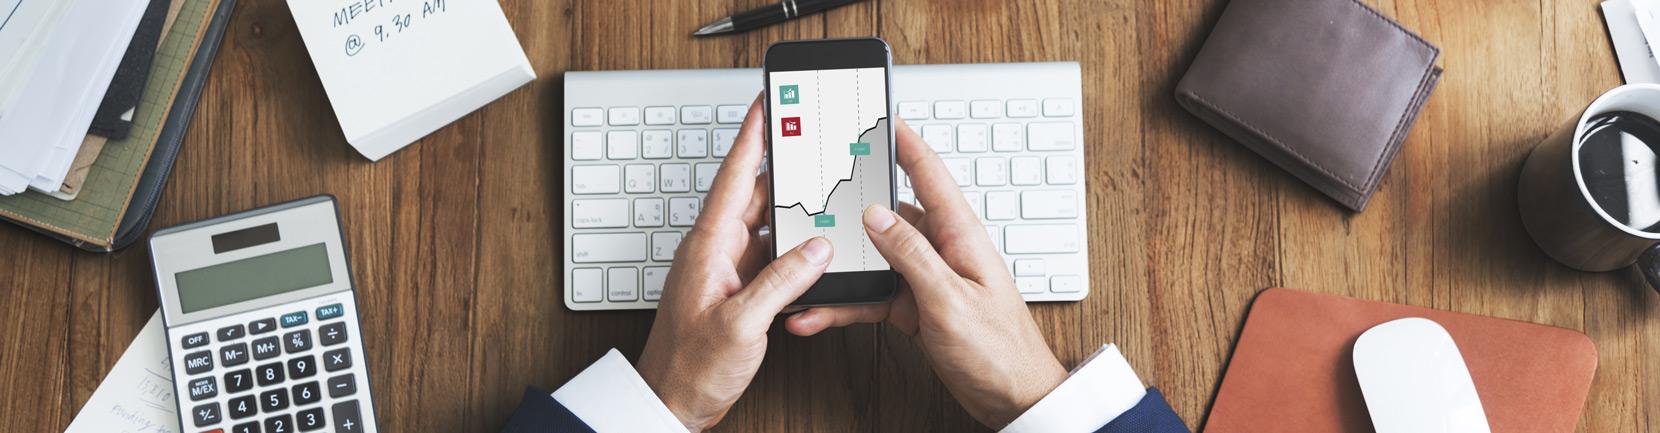 Man looking at pensions graph on phone at desk